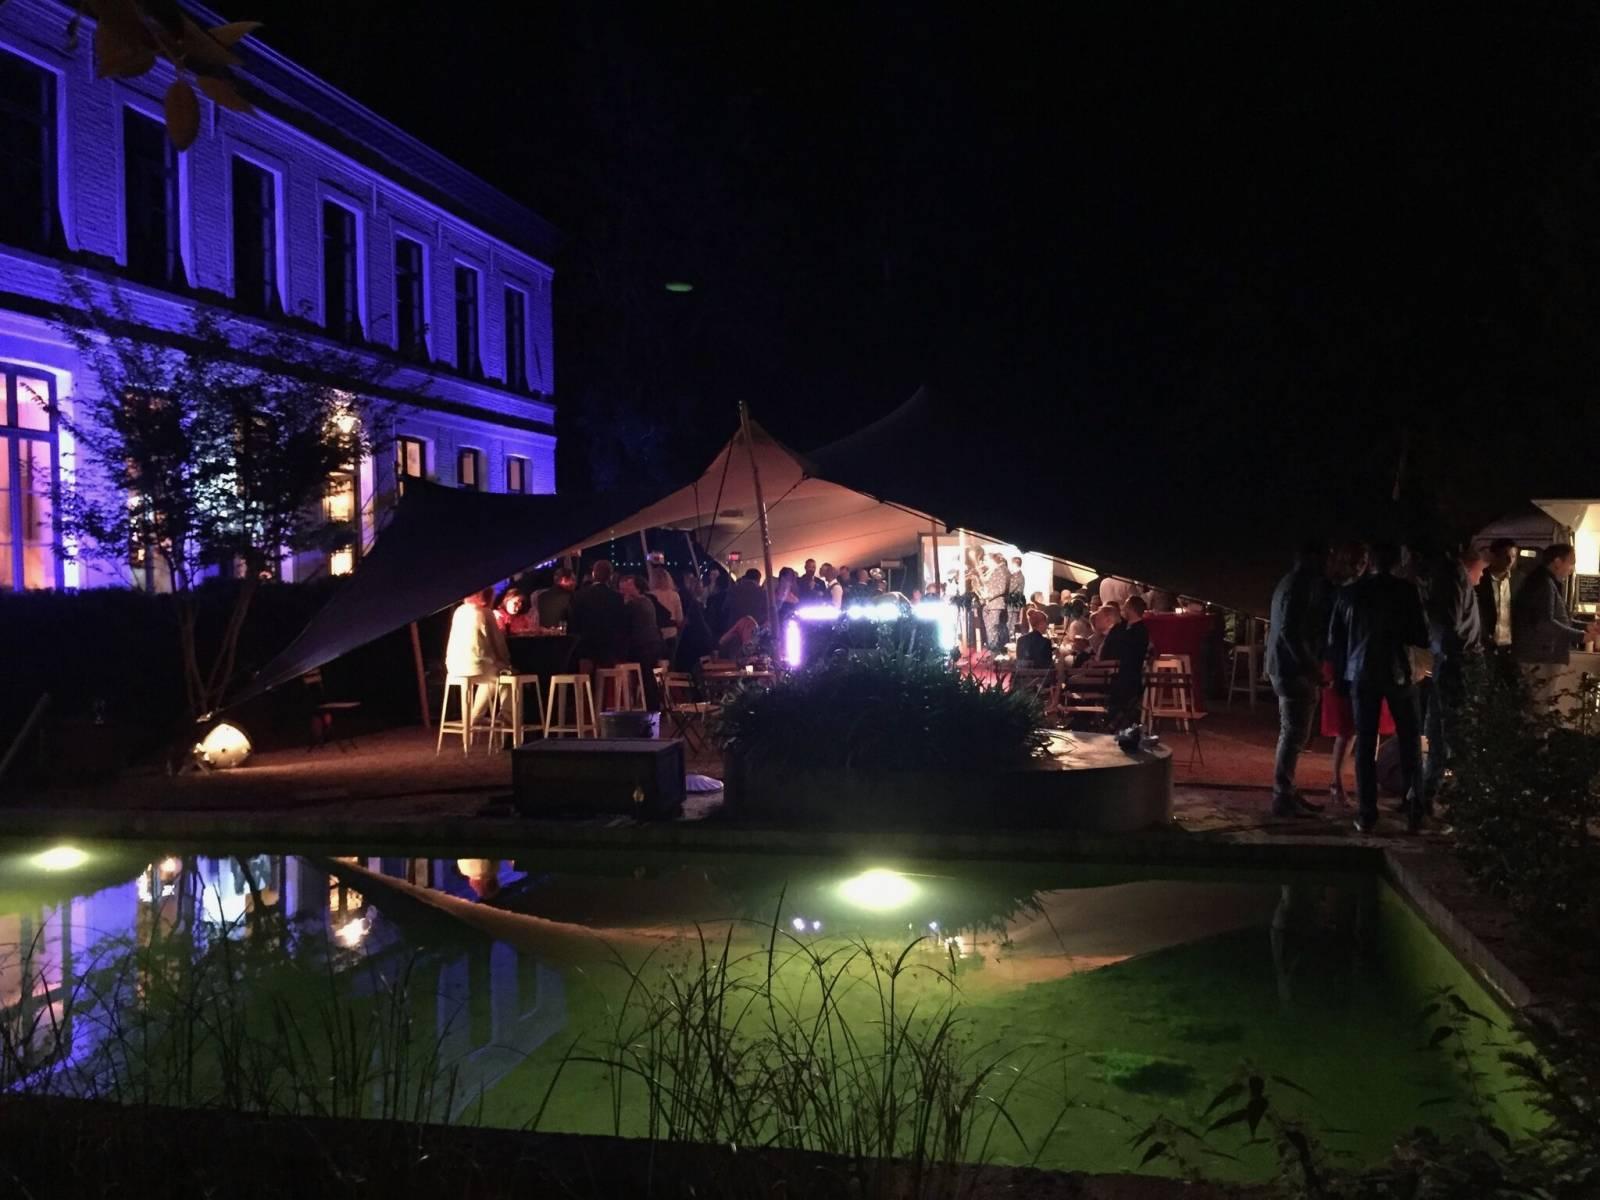 Pastorie Caeneghem - Eventlocatie - House of Events - 13